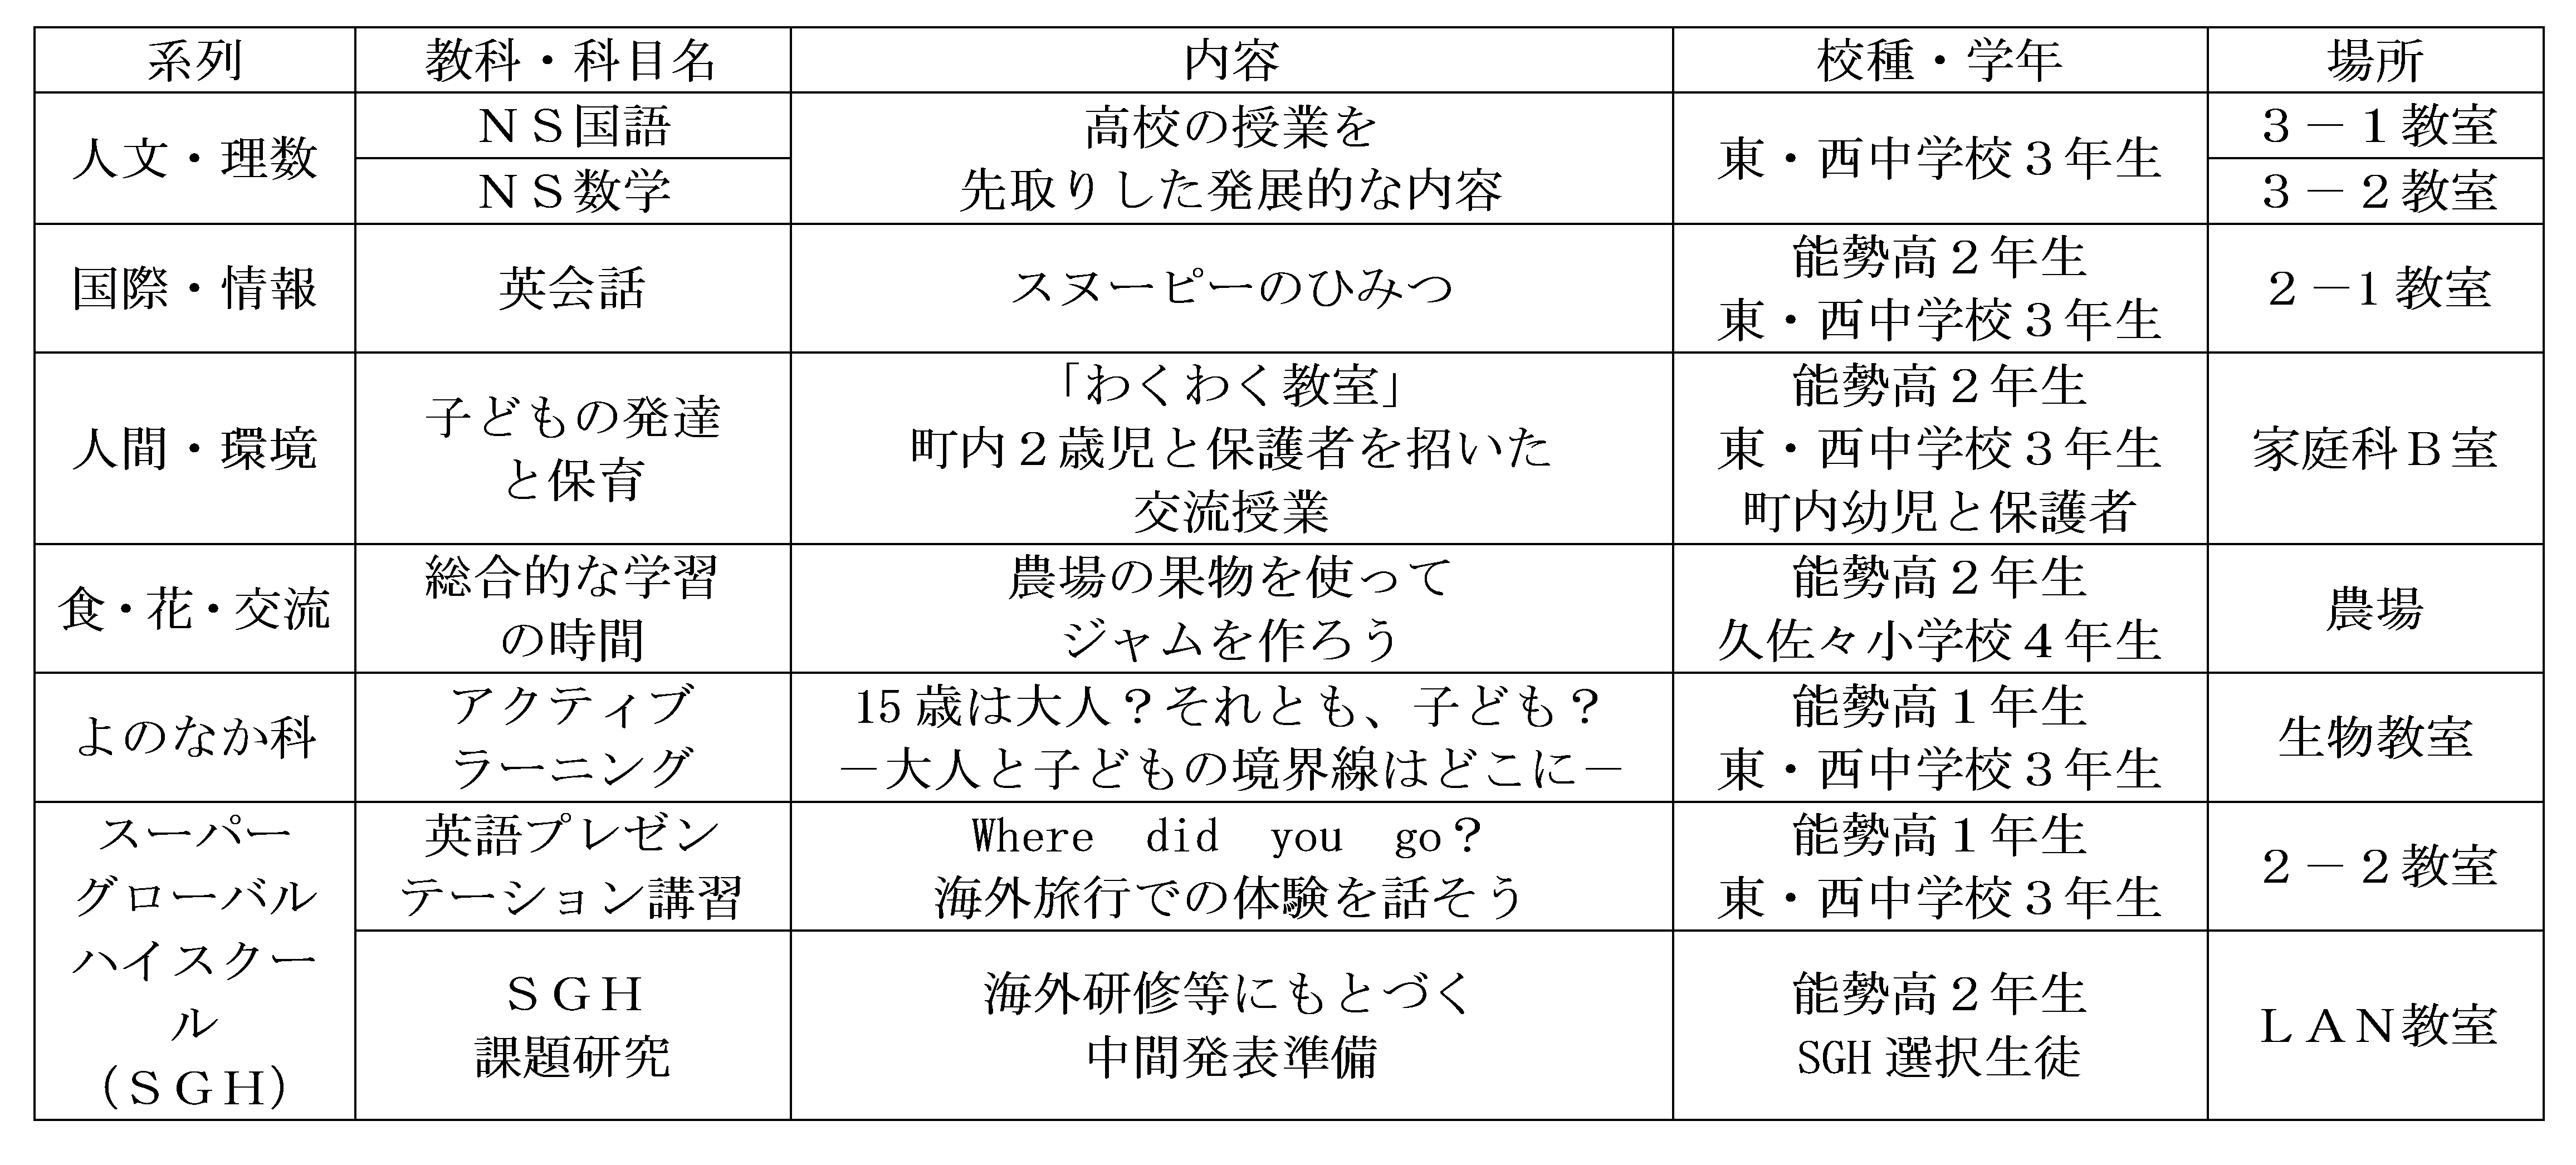 H271120開催要項(授業公開)